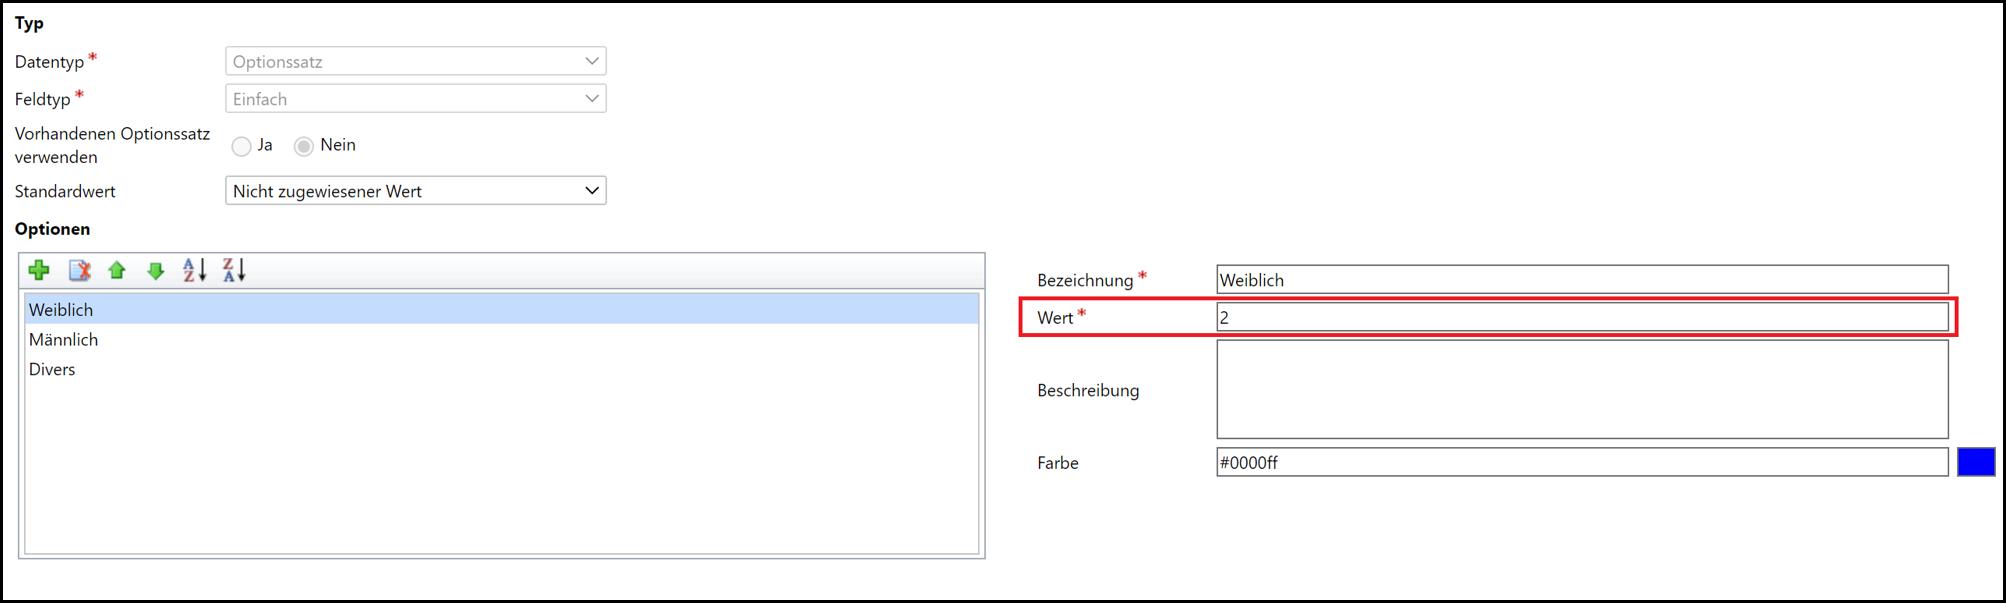 Microsoft_Dynamics _365_Grafiken_in_Ansichtsspalten_hinzufuegen_Abb3